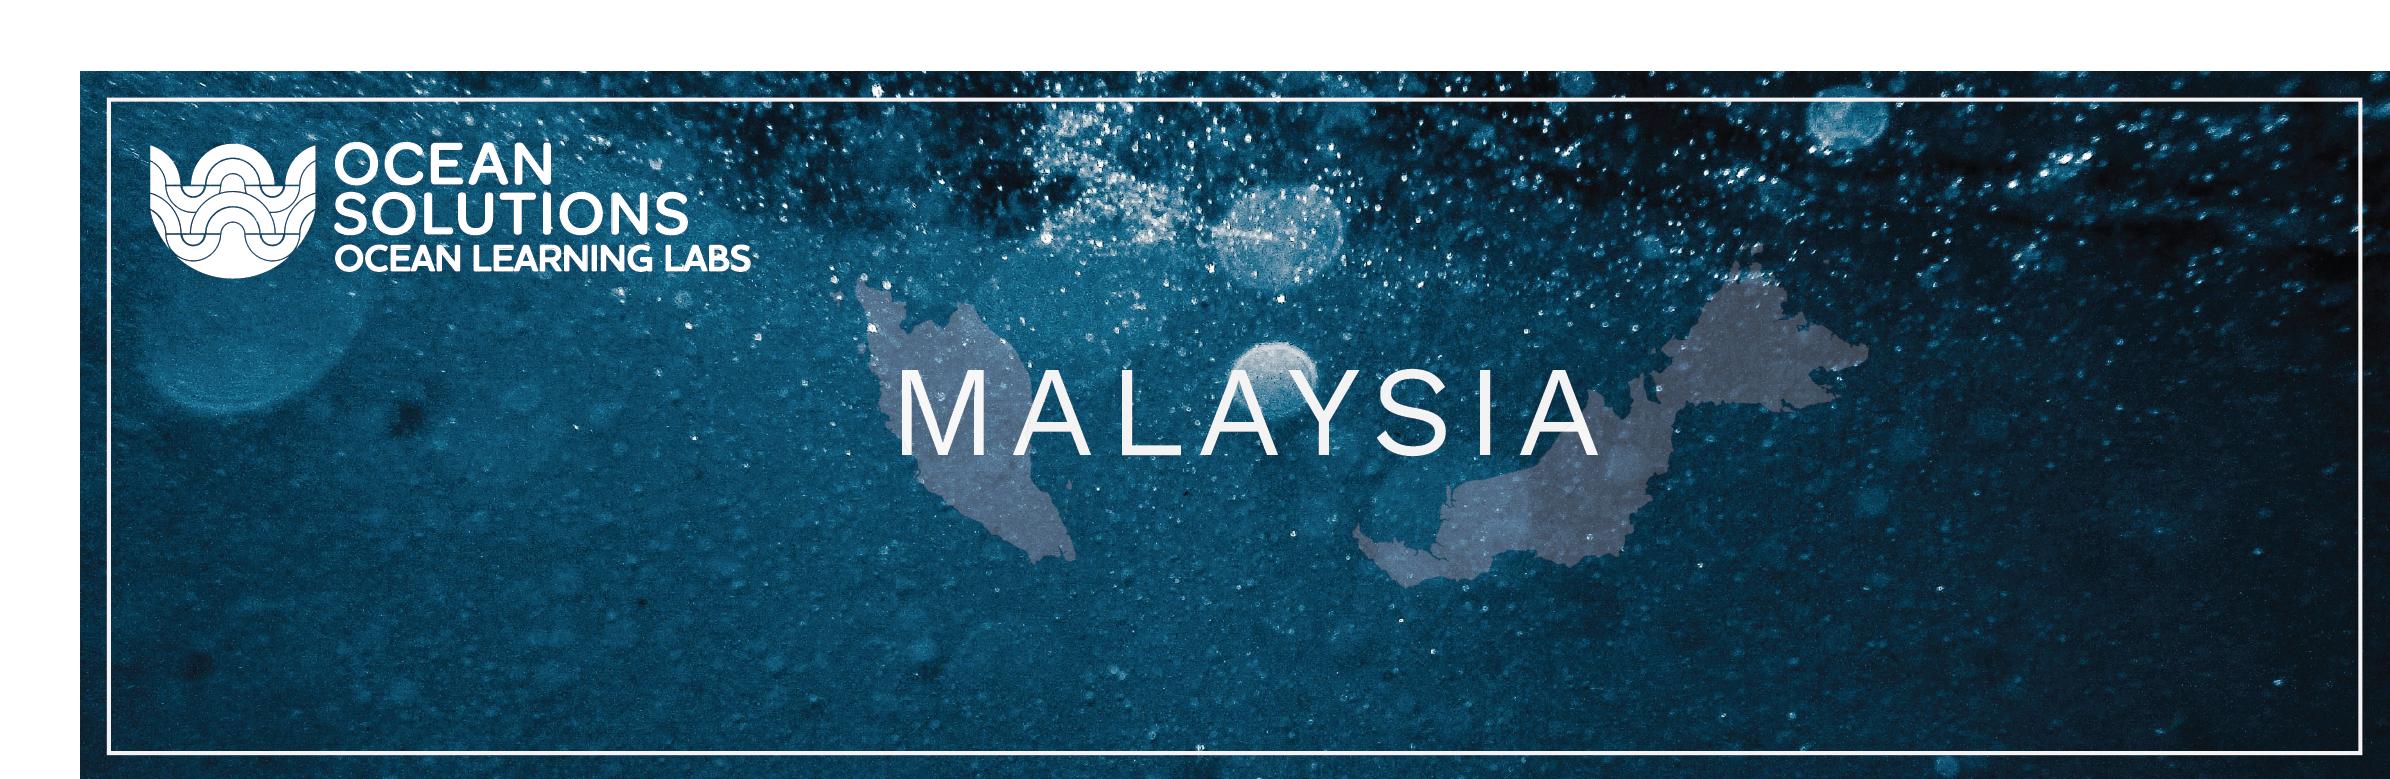 LearningLabBanners-Malaysia